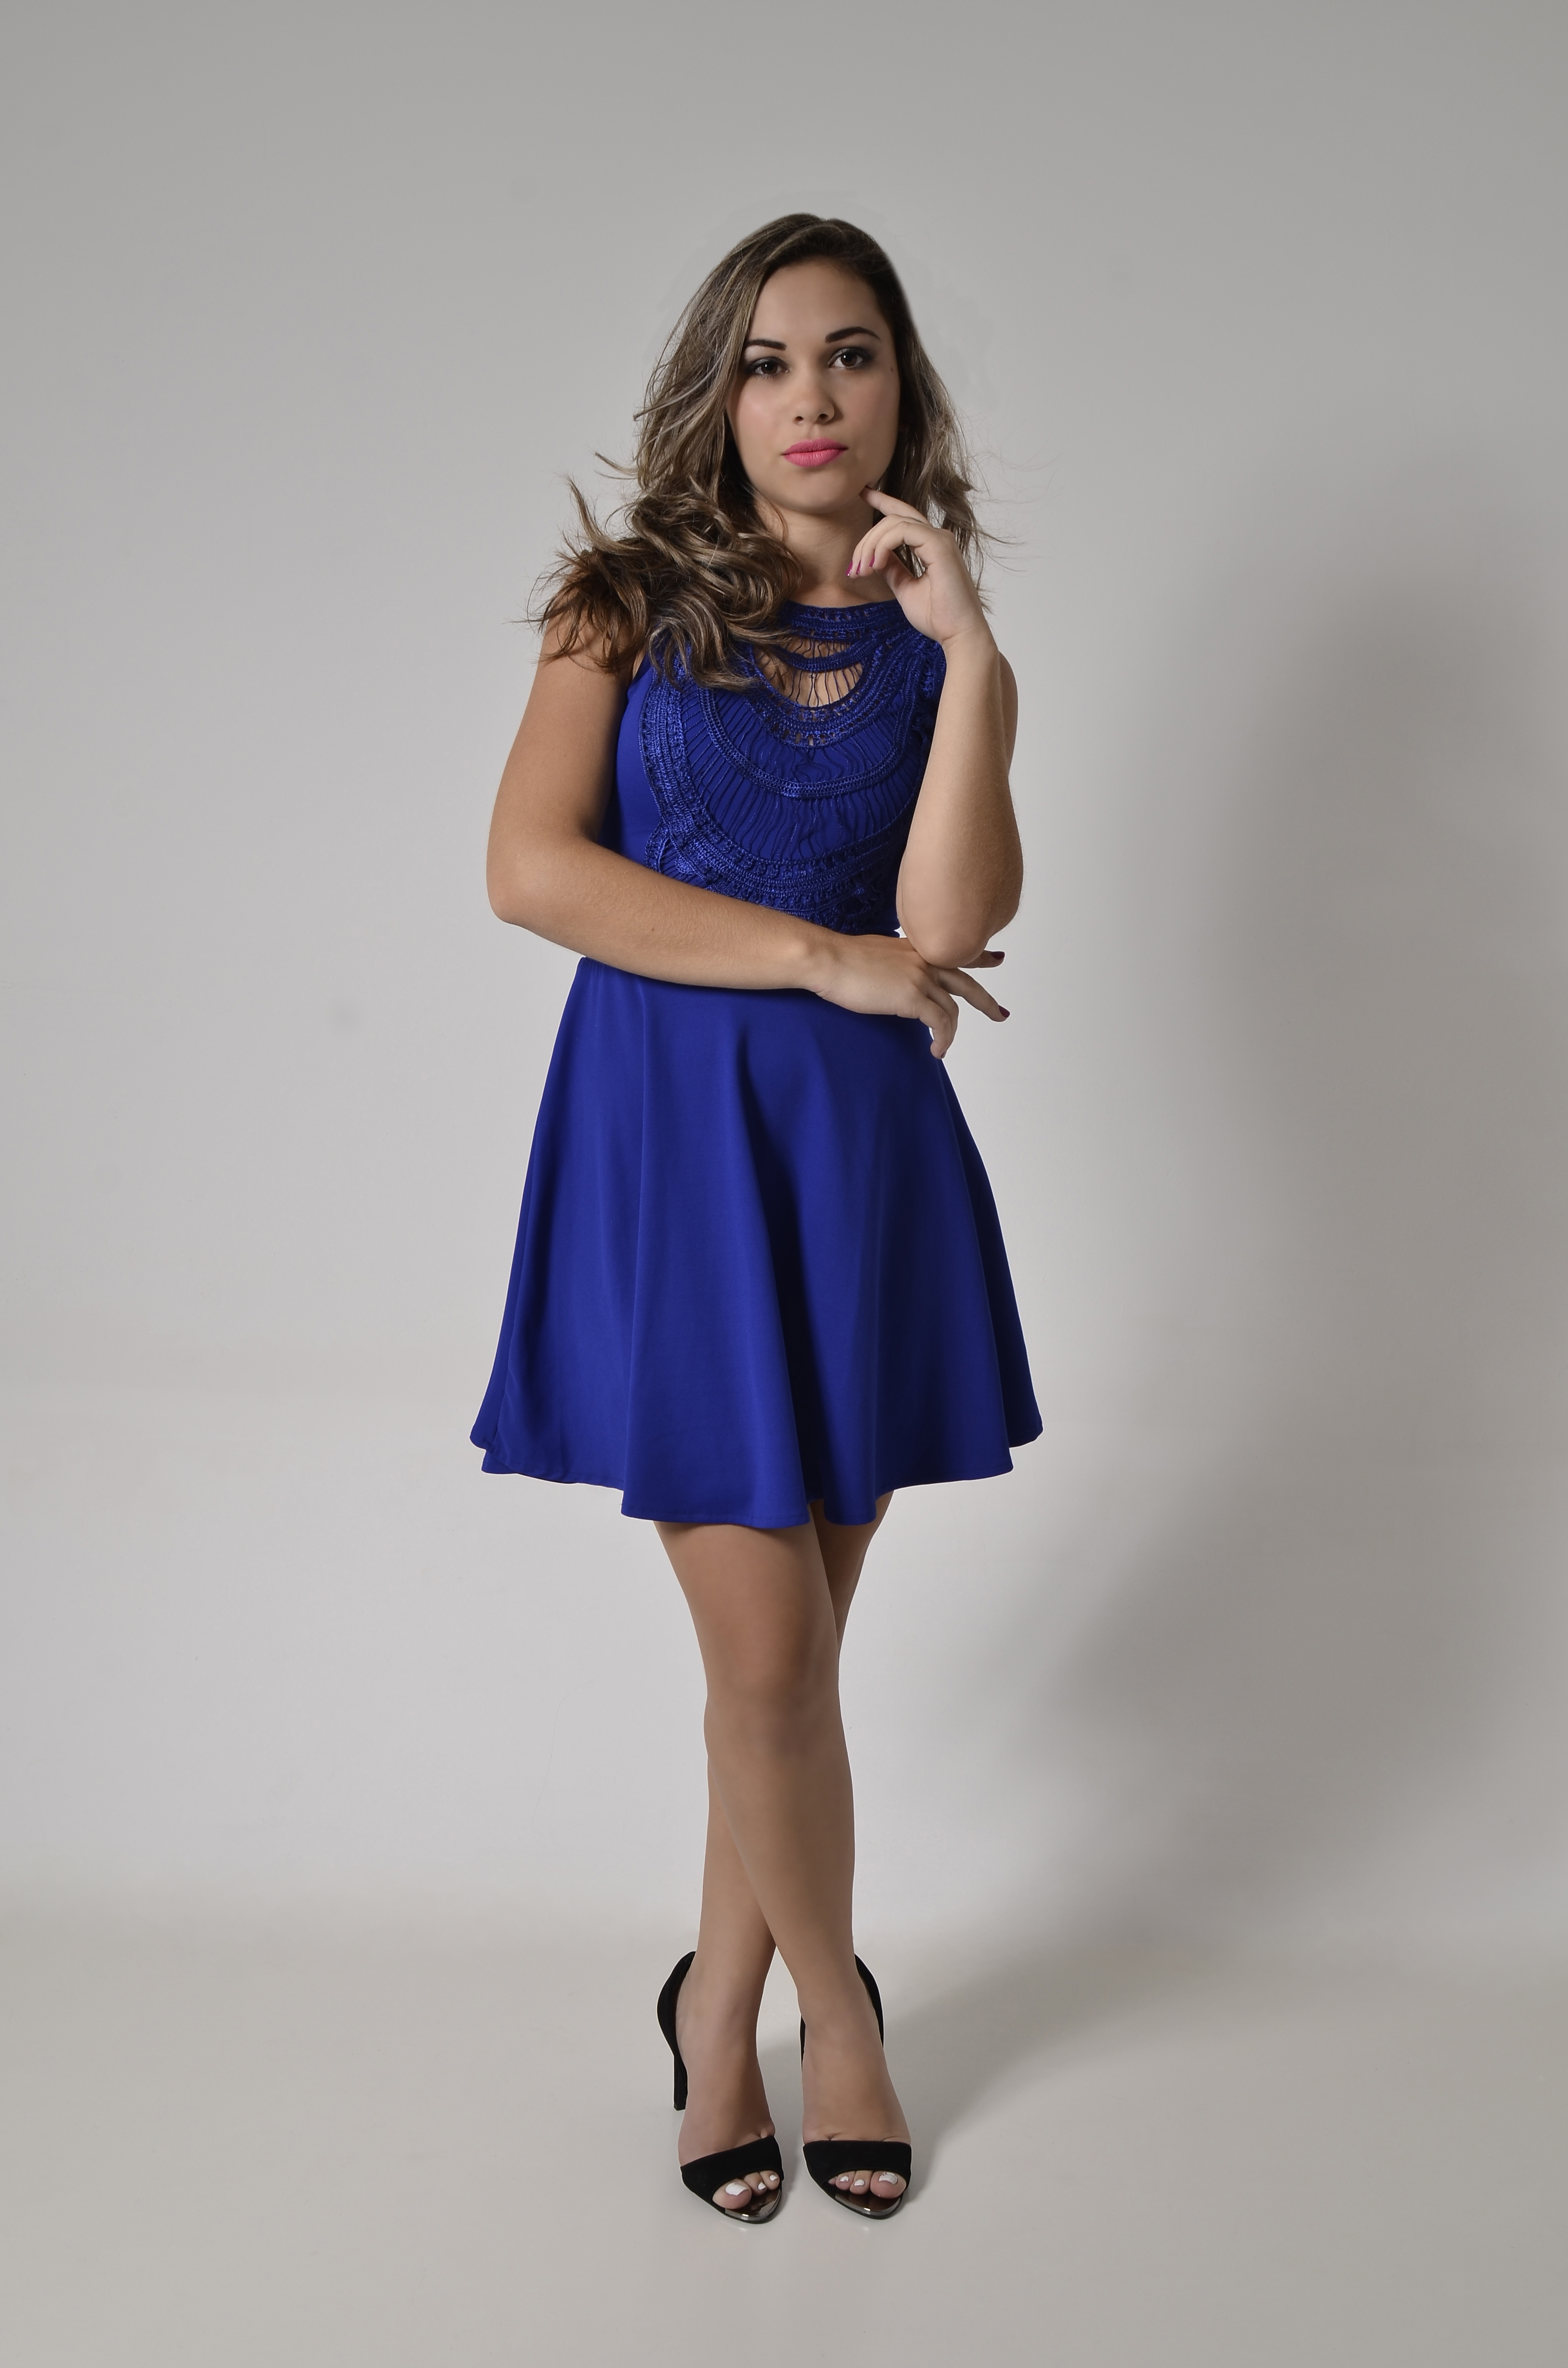 Ana Villalva